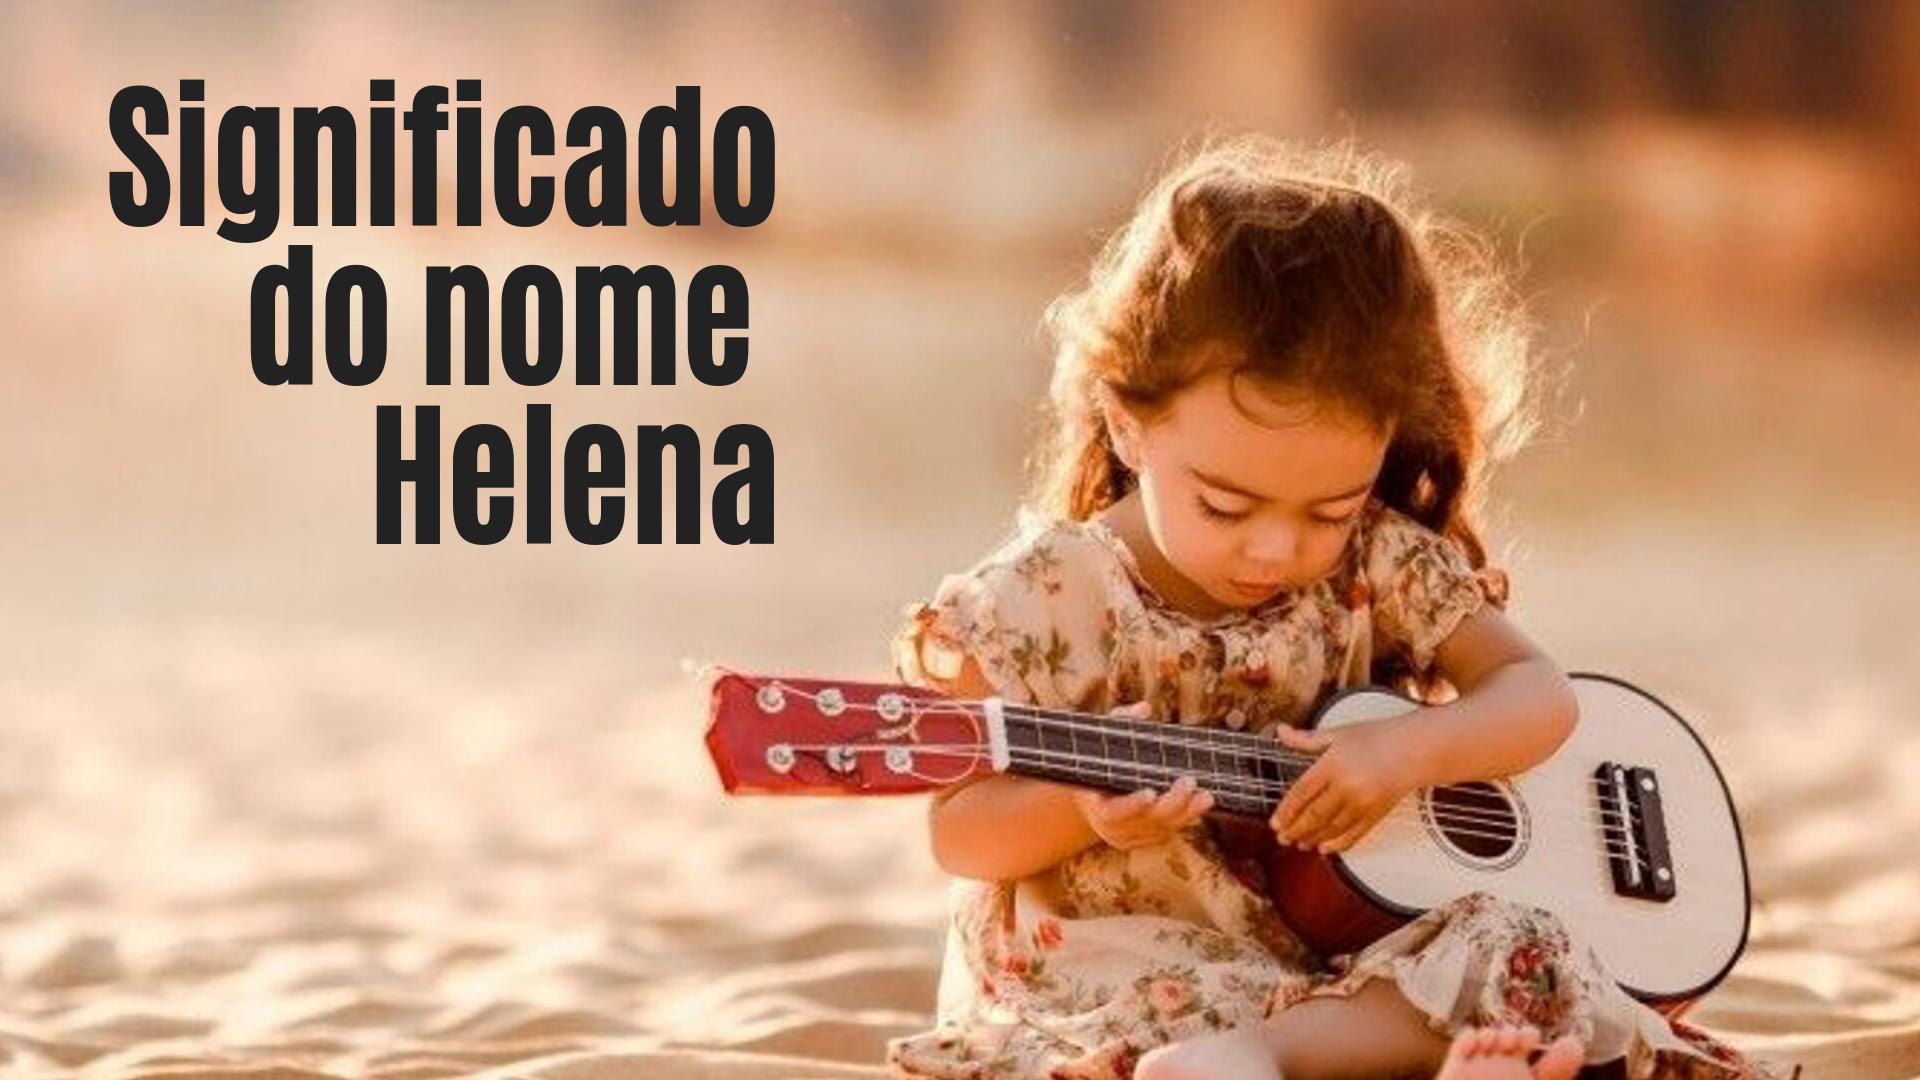 foto escrita significado do nome Helena